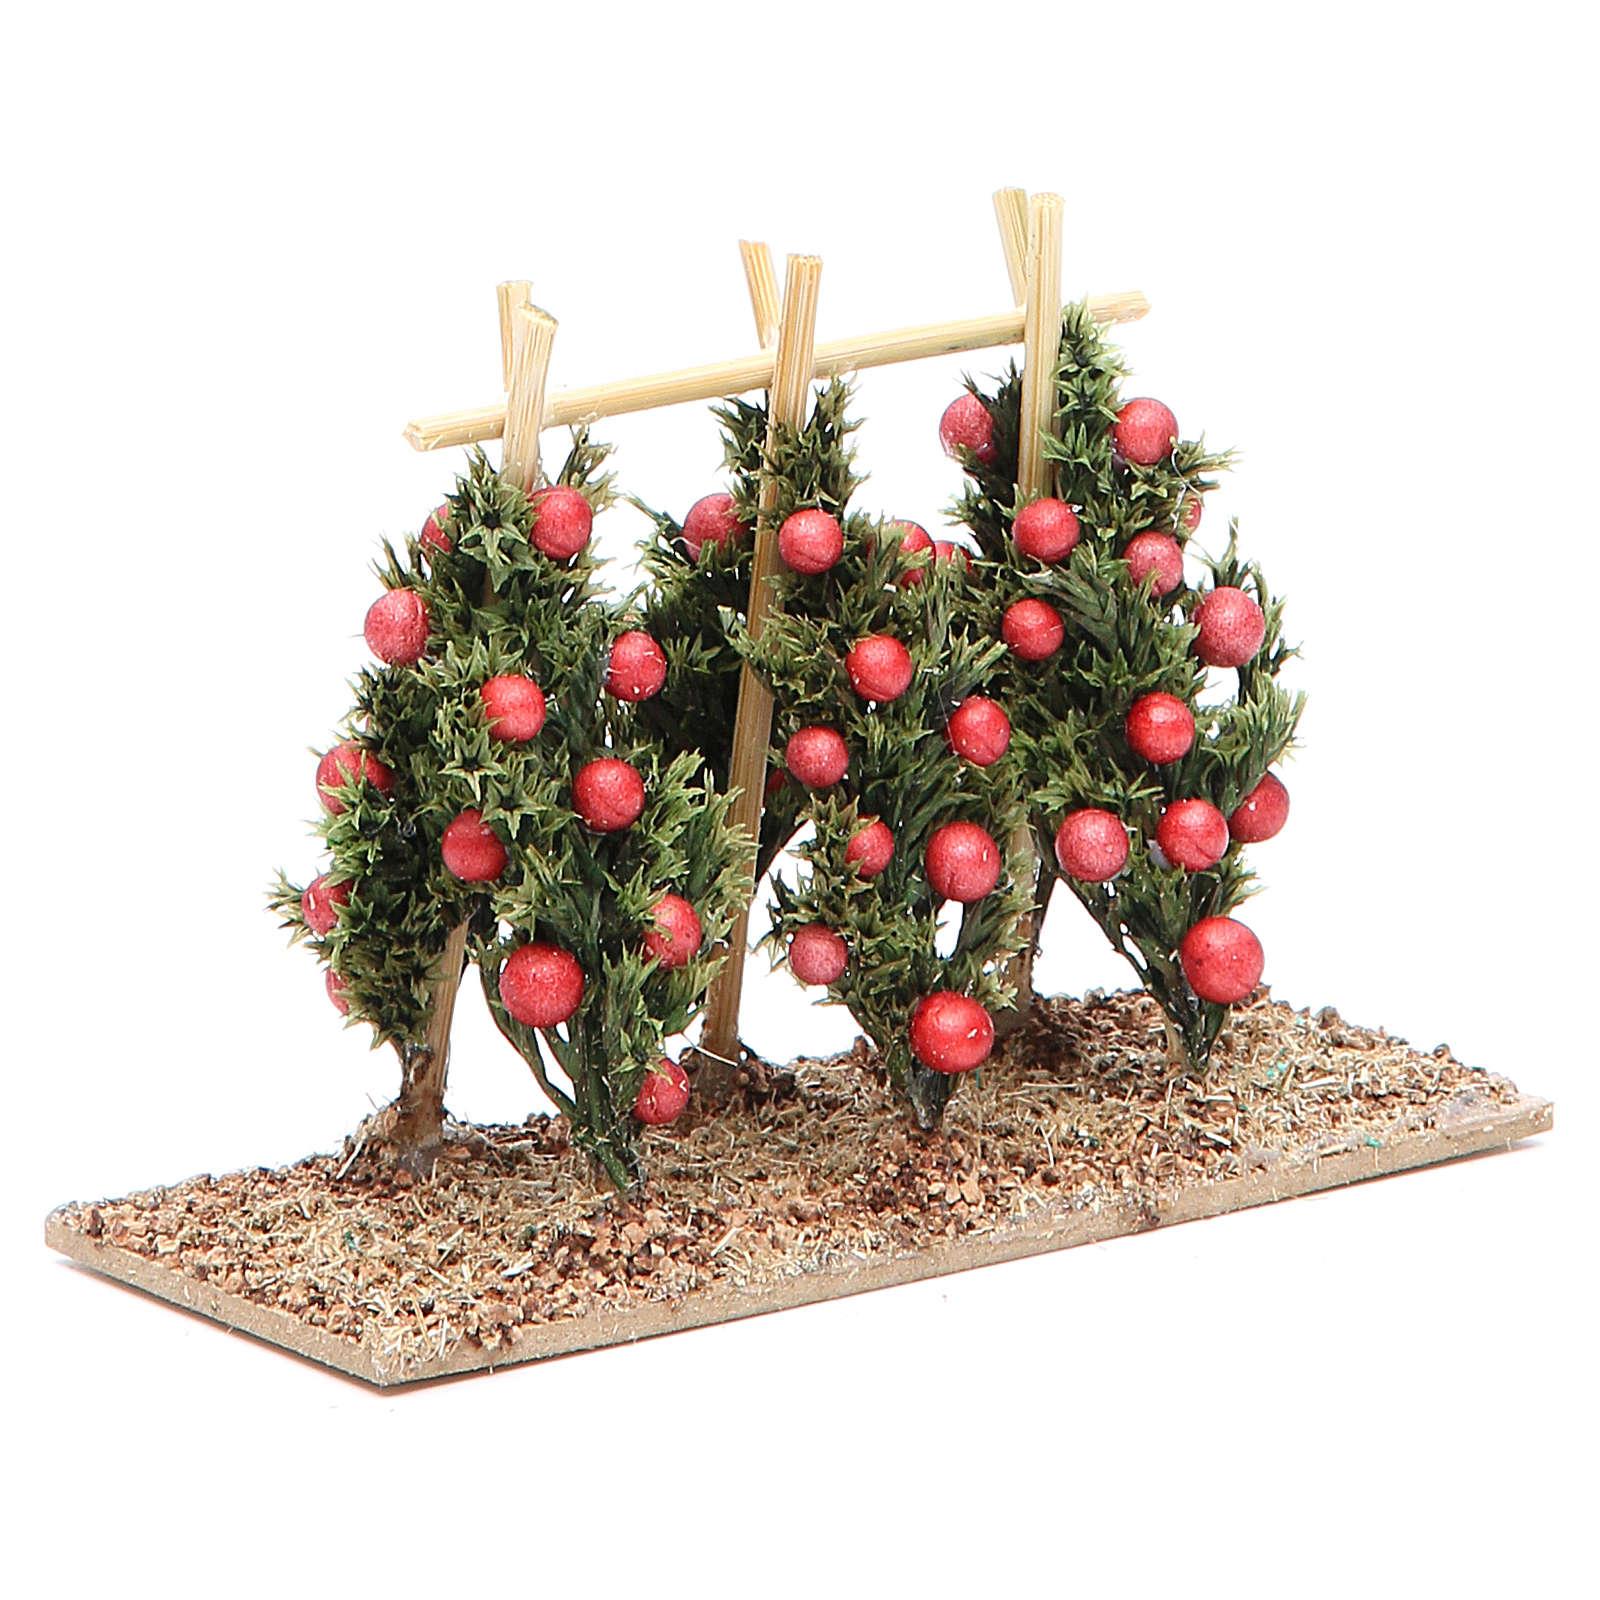 Pianta di pomodori presepe 4